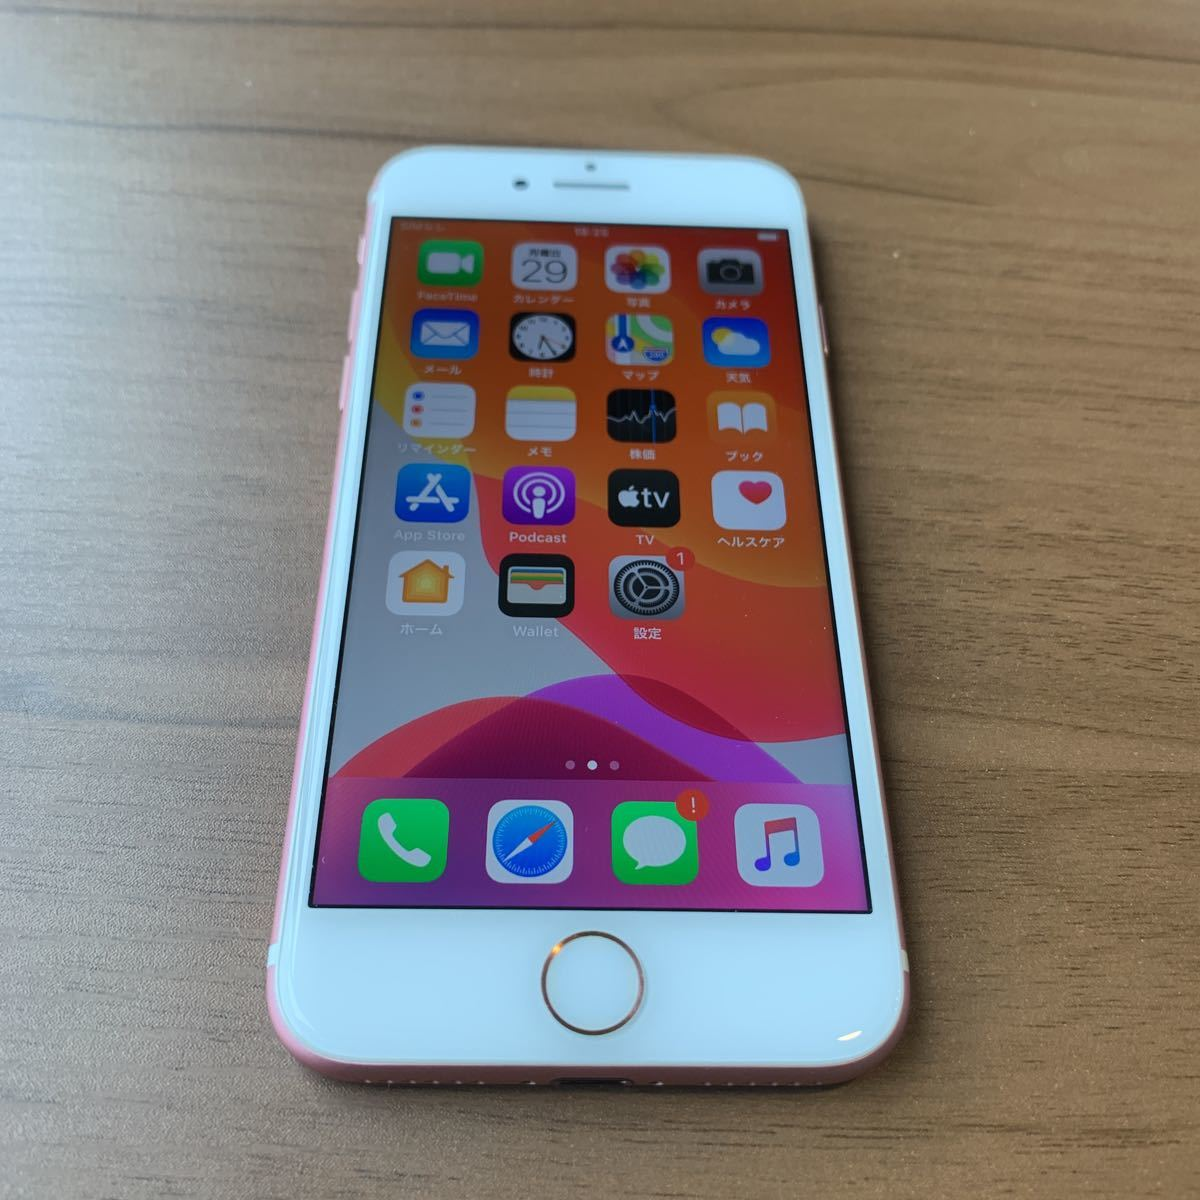 iPhone7 32G Rose GOLD SIMフリー 中古 比較的美品 6596_画像1